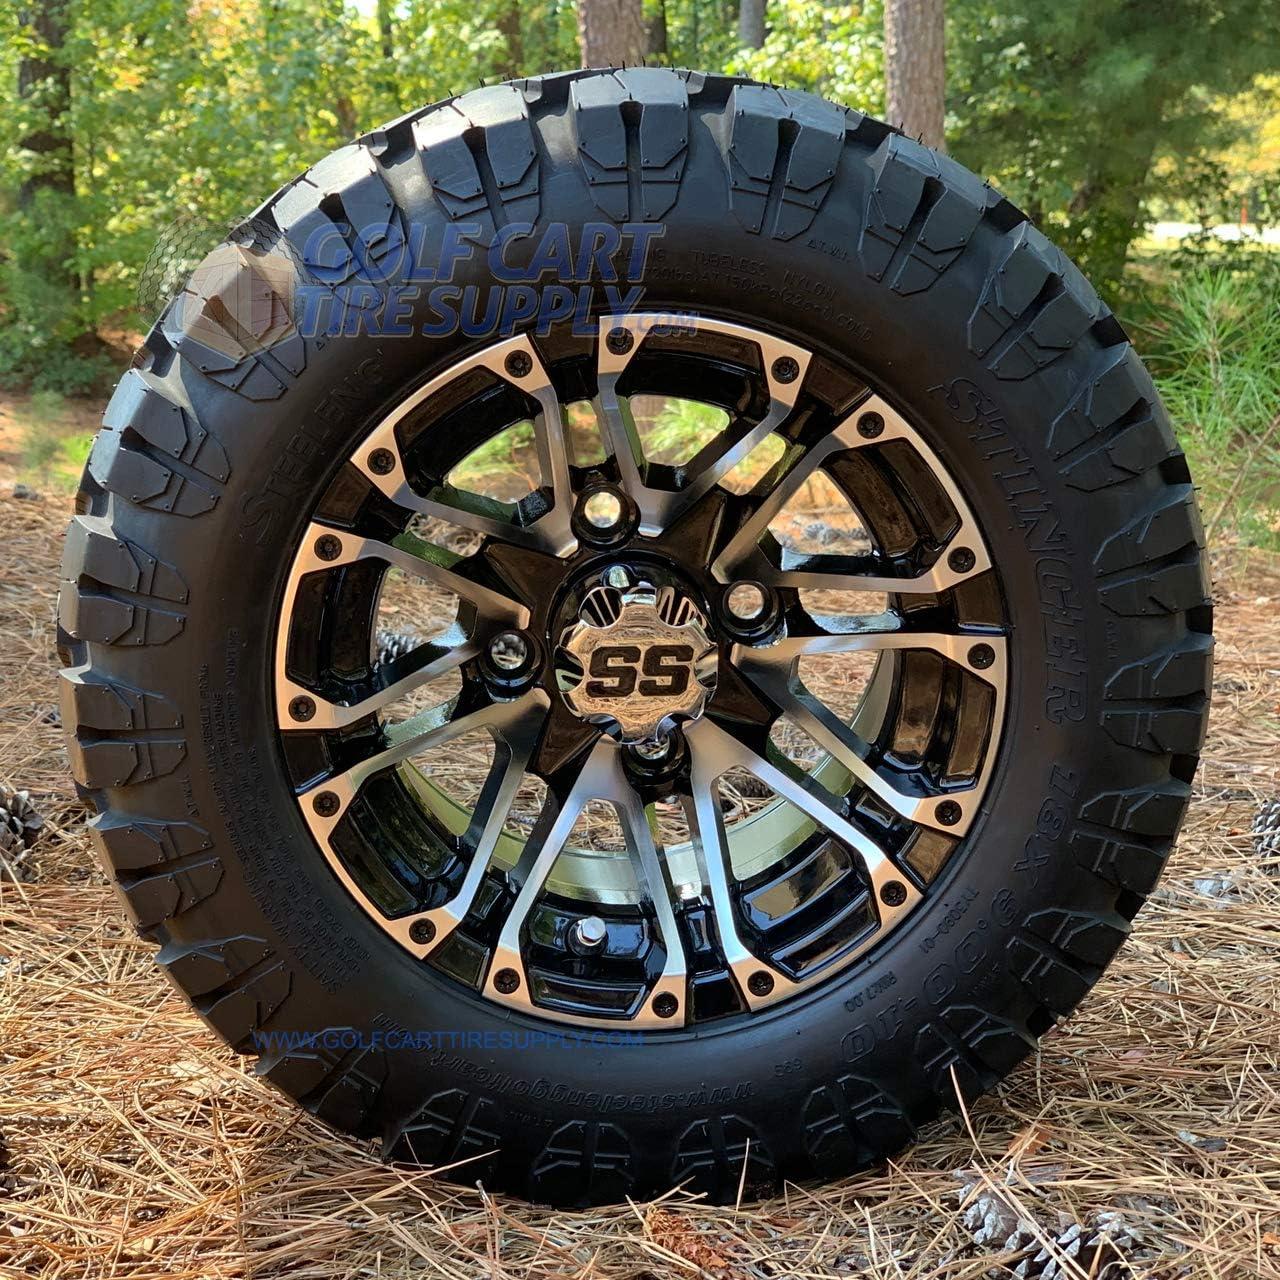 Amazon Com 10 Lancer Golf Cart Wheels And 18x9 10 Dot Stinger All Terrain Golf Cart Tires Combo Set Of 4 Fits All Carts Automotive